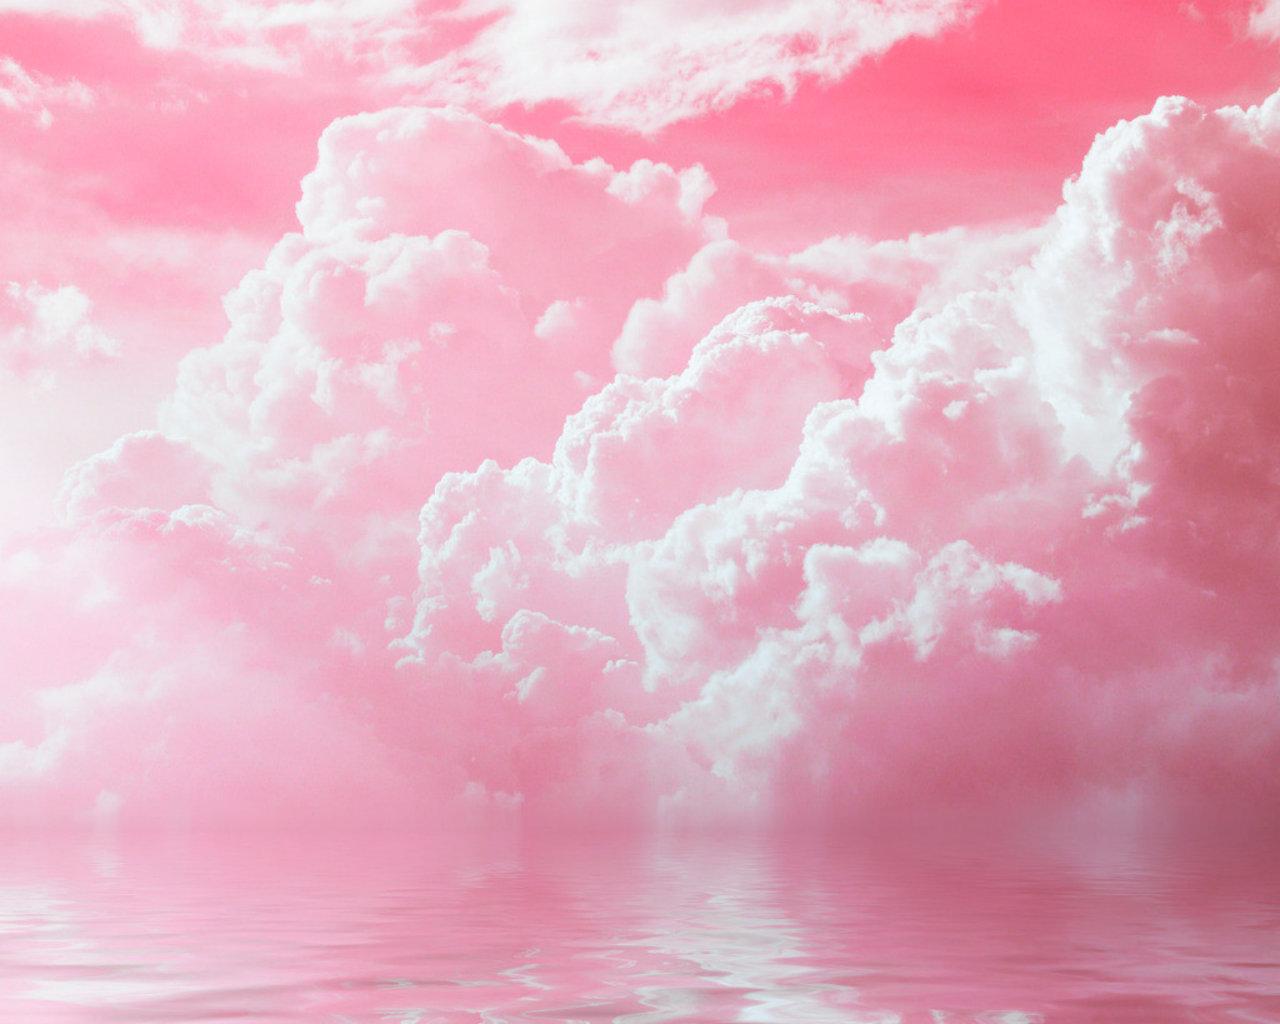 Cute Iphone Wallpaper Ideas Pink Cloud